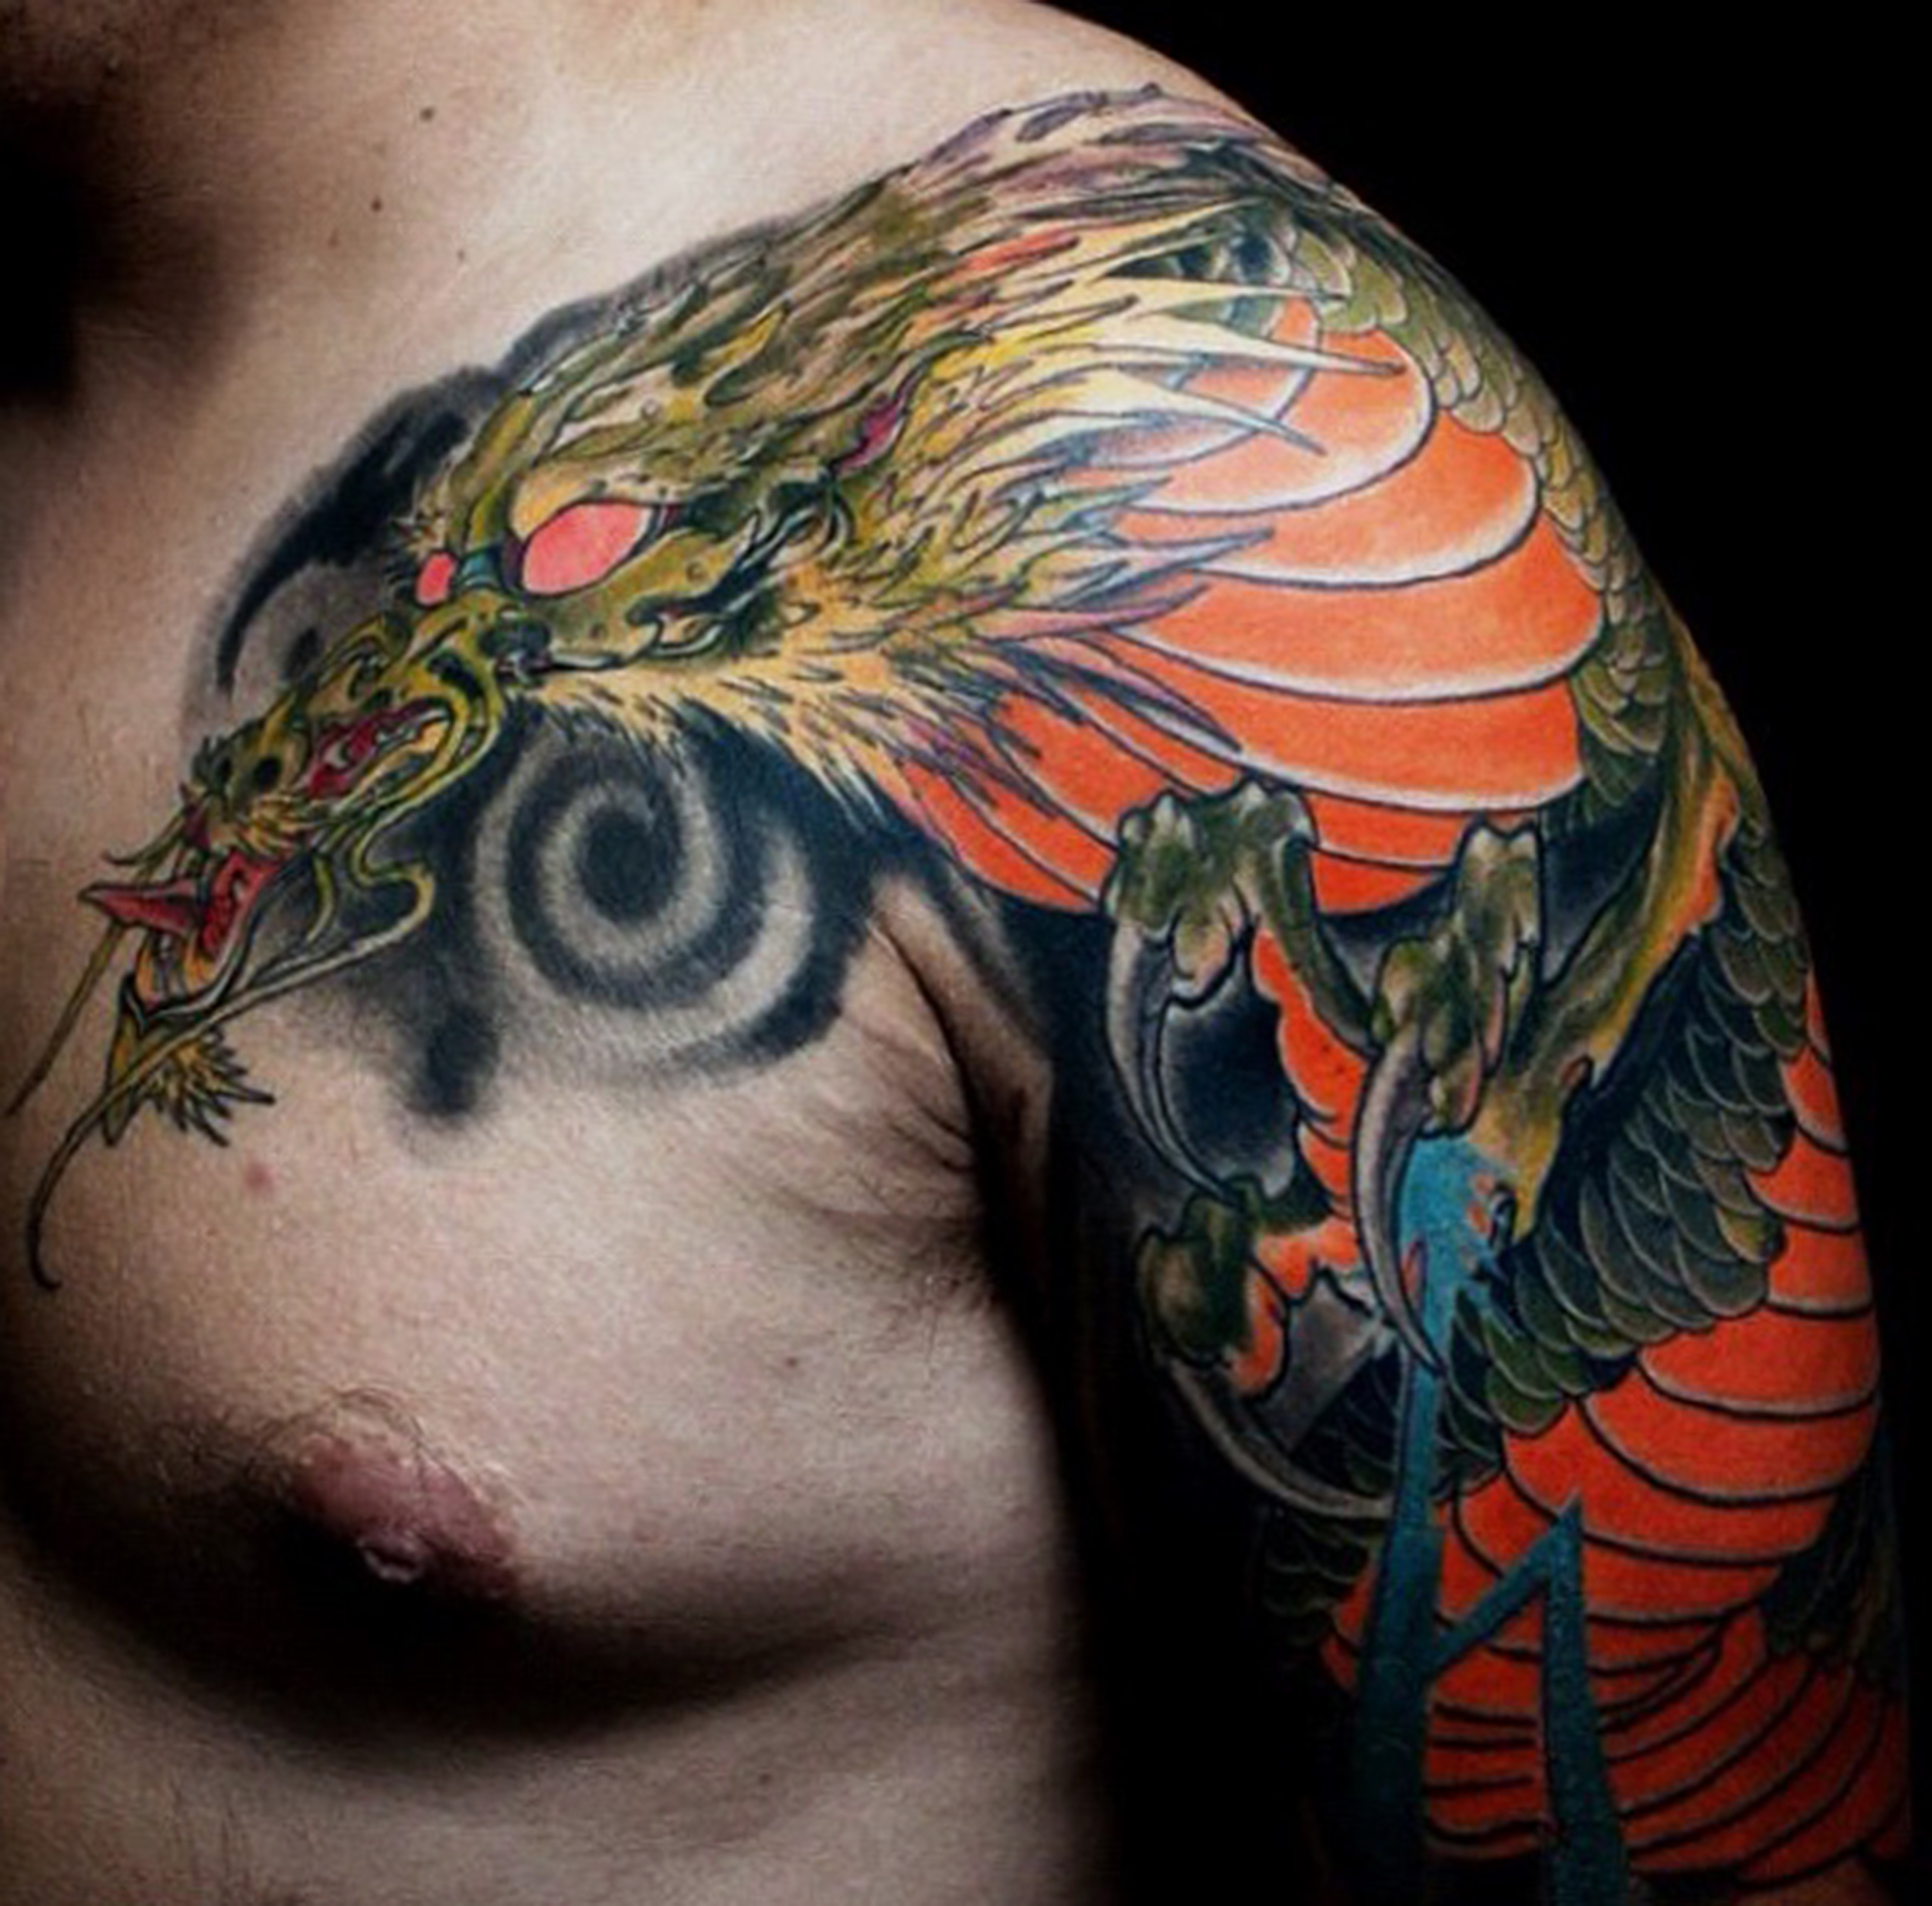 dragon-arm-sleeve-Tattoo -LA-LosAngeles-besttattoo-besttattooartist-besttattooartists-top-pictures-images-photo-tat-ink-inked-bigboy-guestartist-rabblerousertattoo